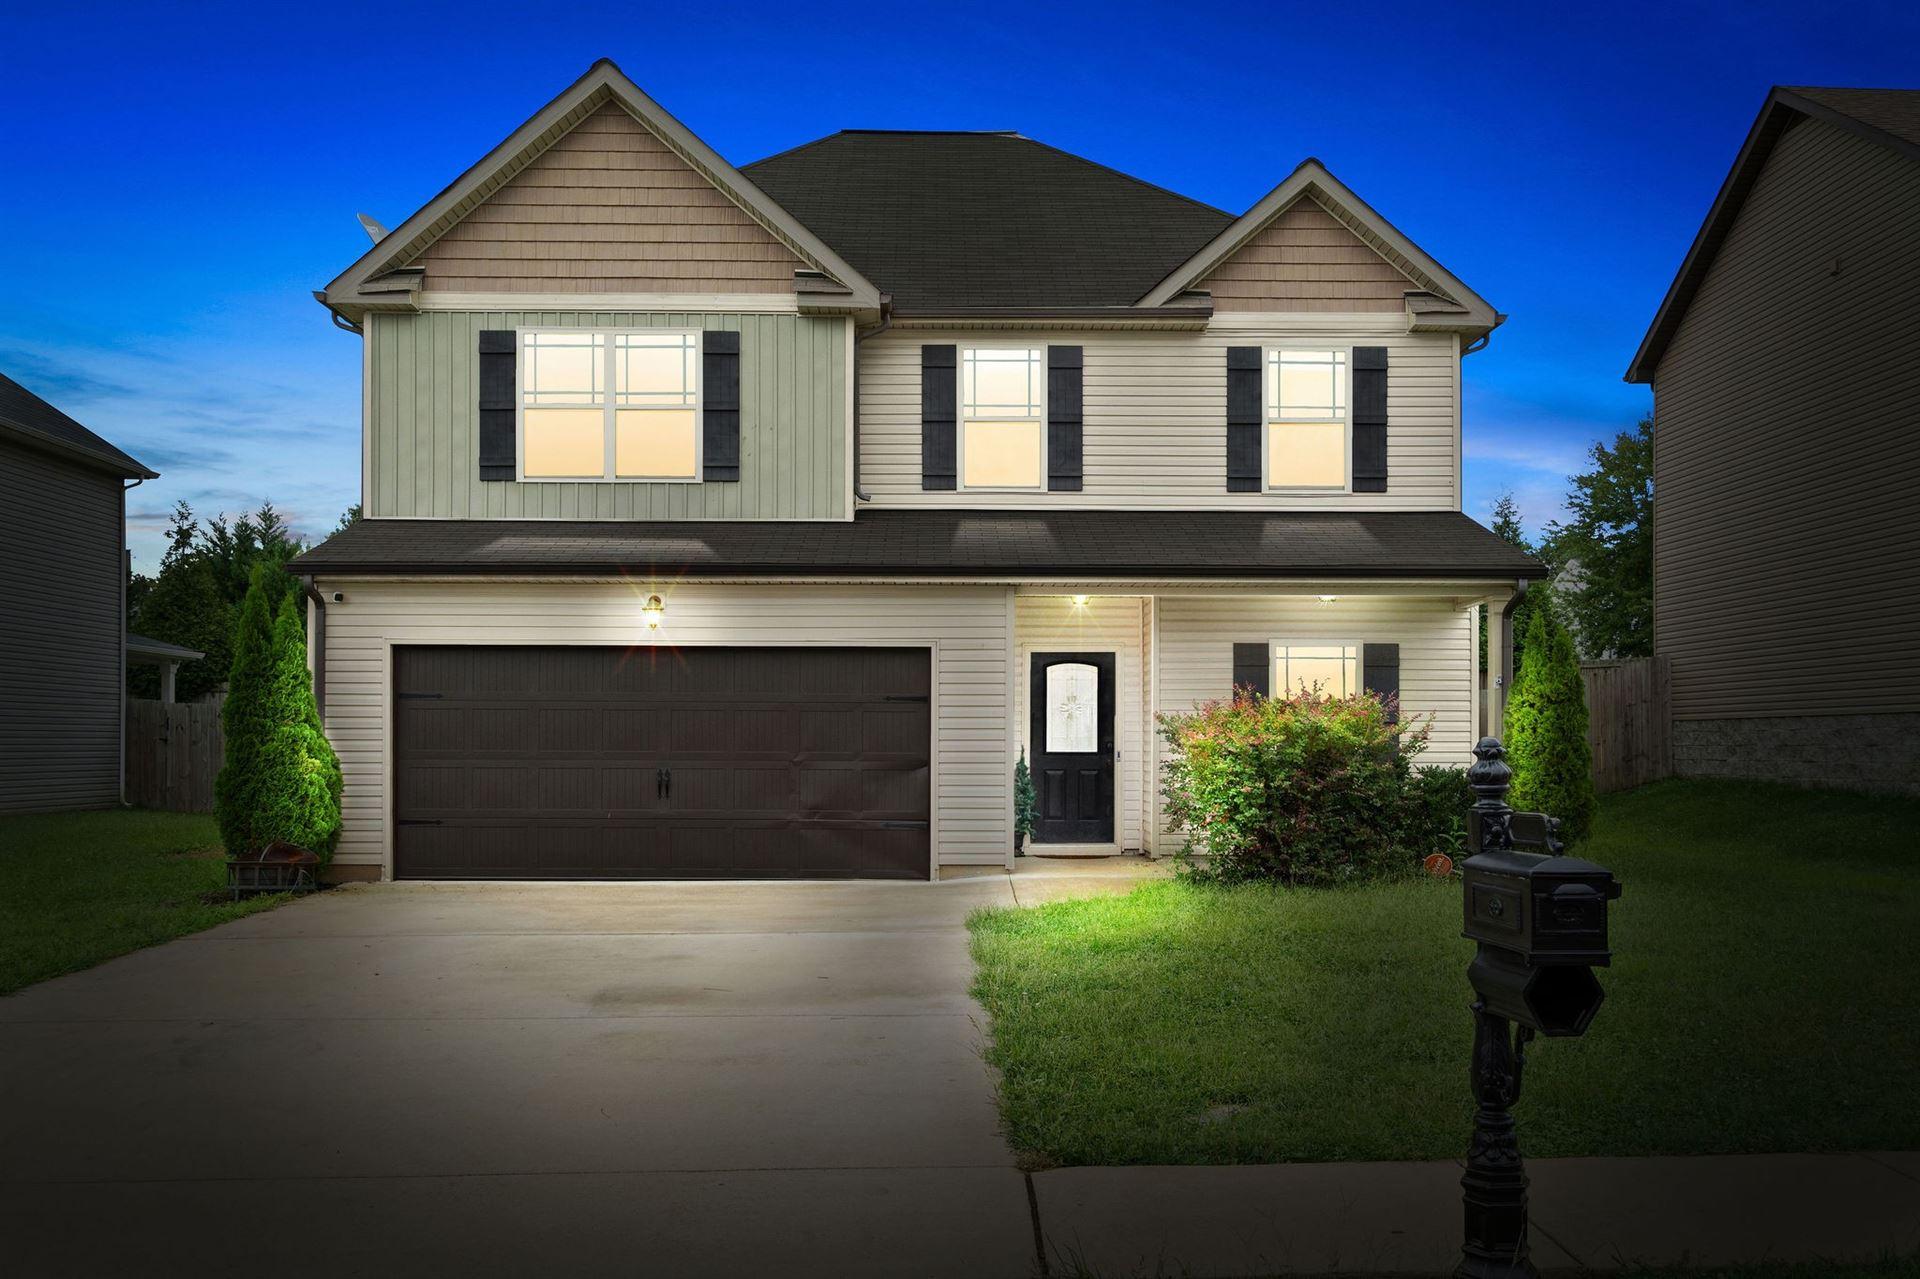 3421 Oconnor Ln, Clarksville, TN 37042 - MLS#: 2293201